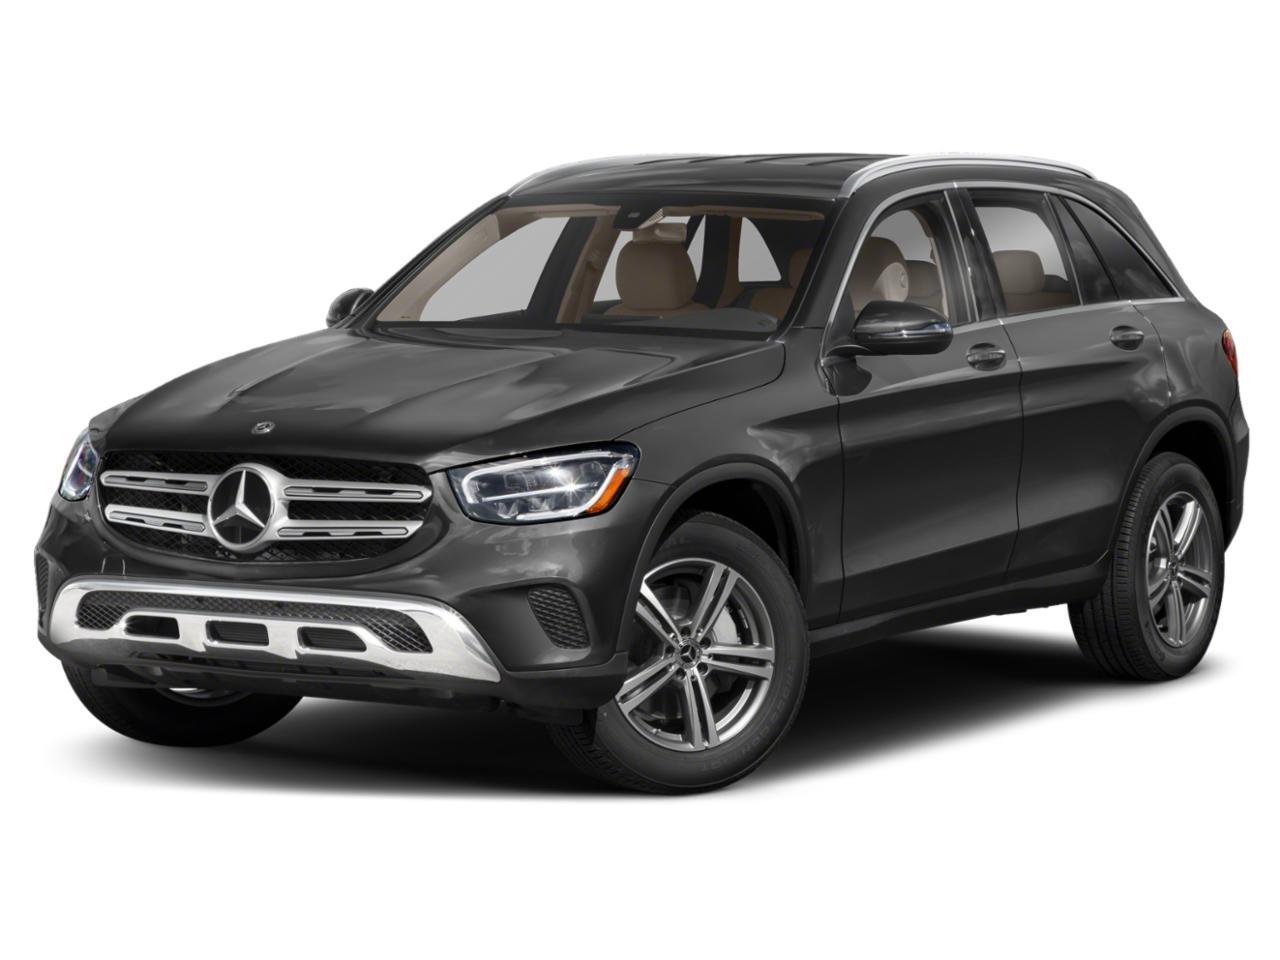 2020 Mercedes-Benz GLC Vehicle Photo in Appleton, WI 54913